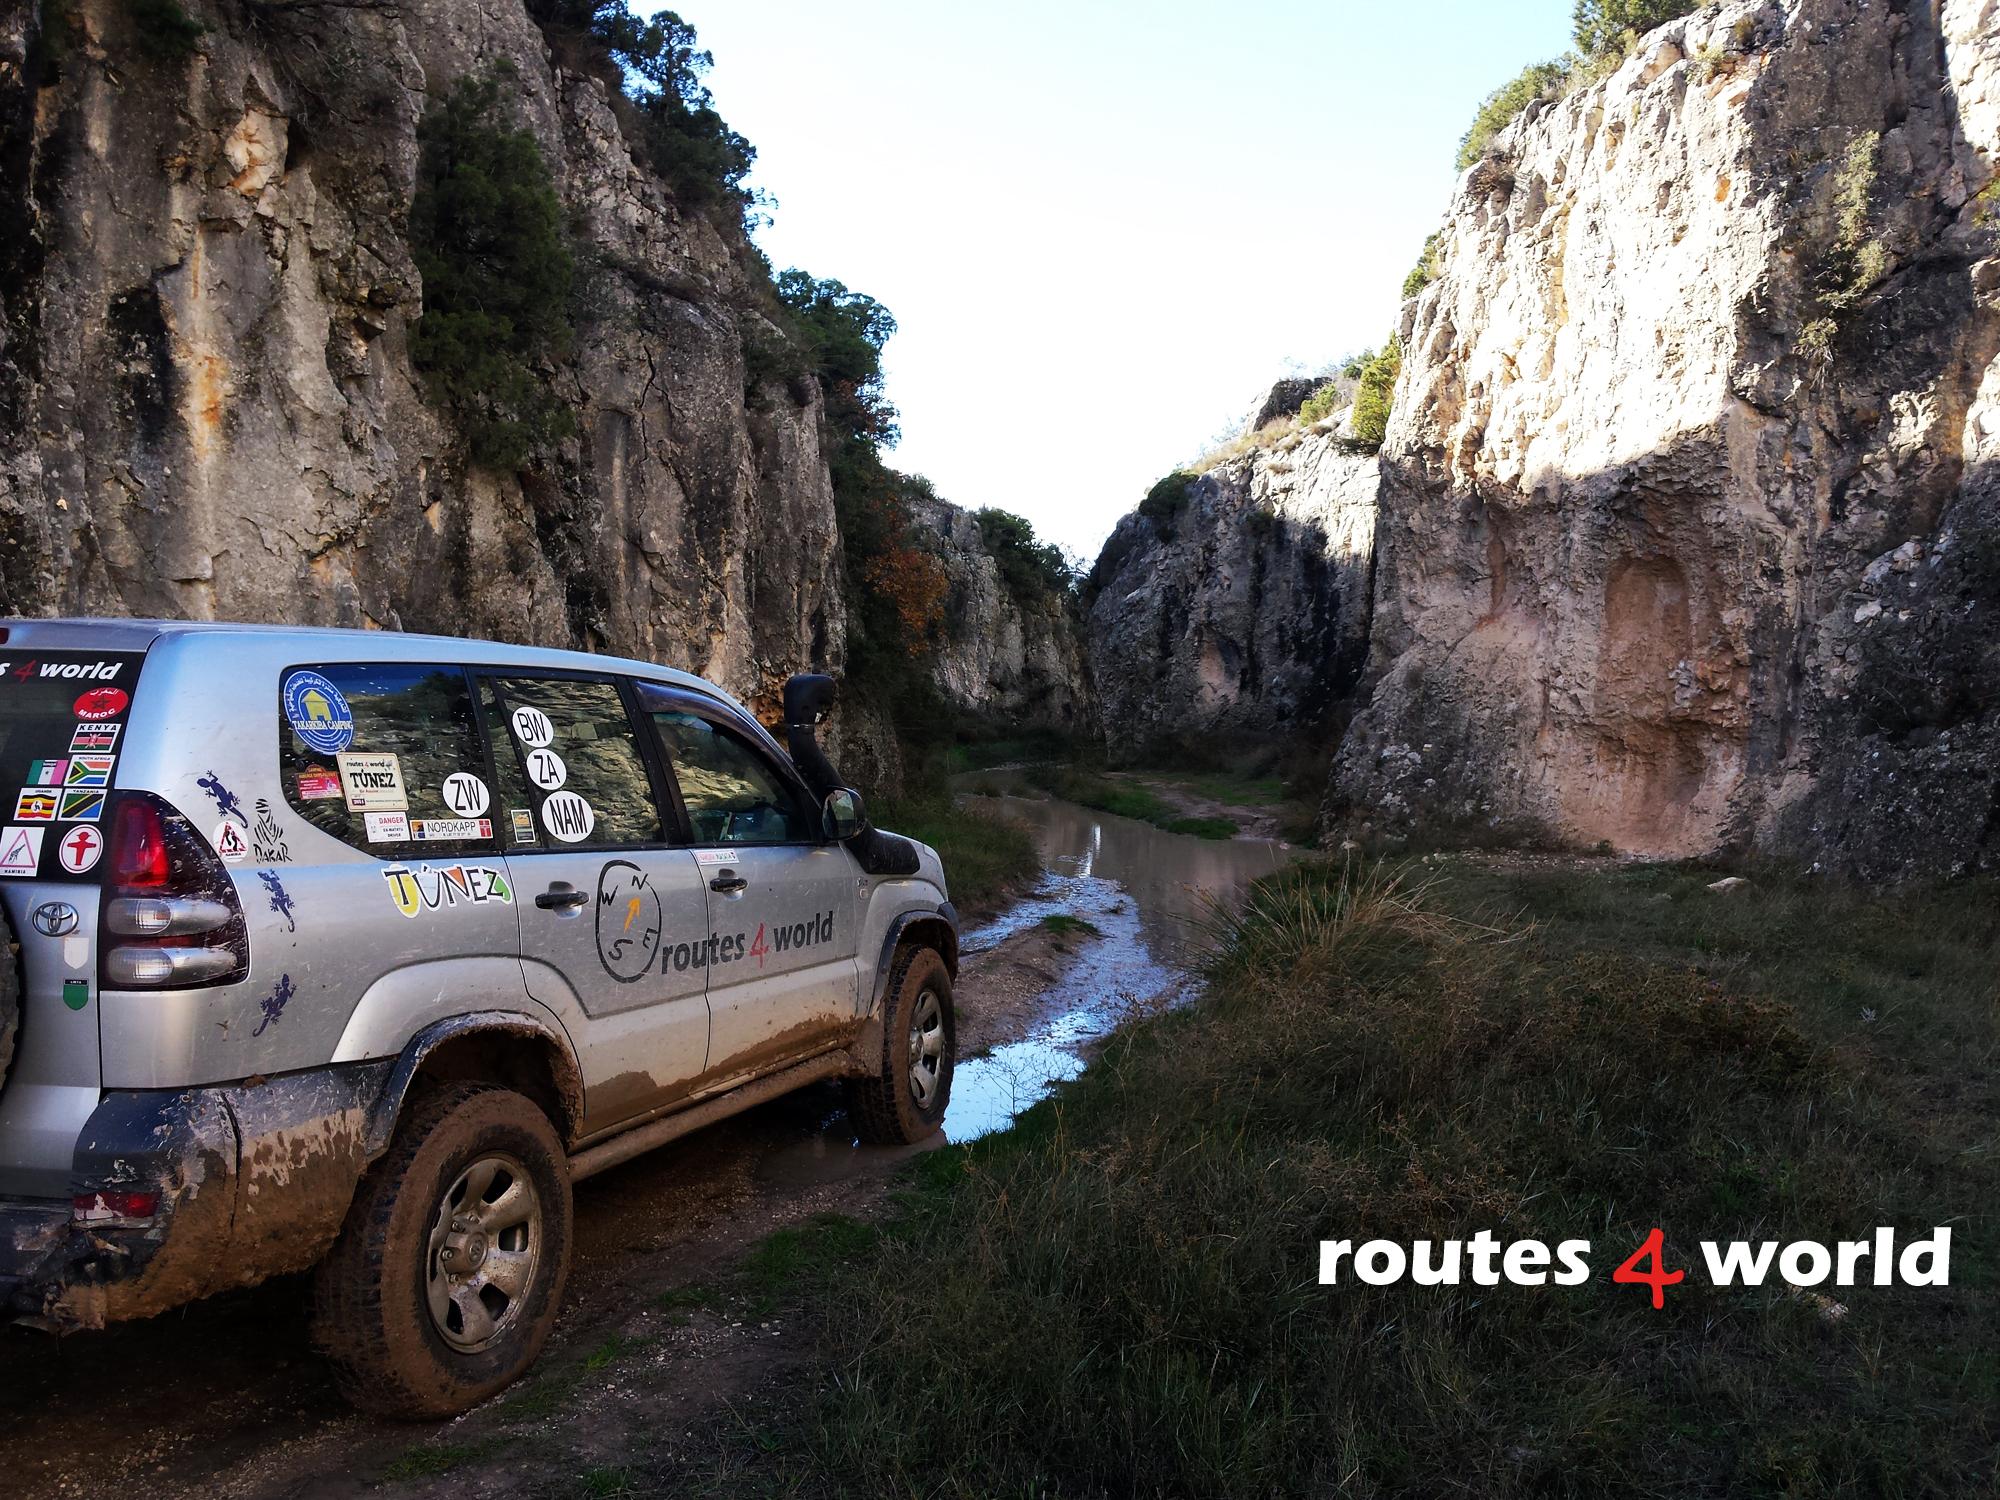 Monegros R4W - routes4world (60)